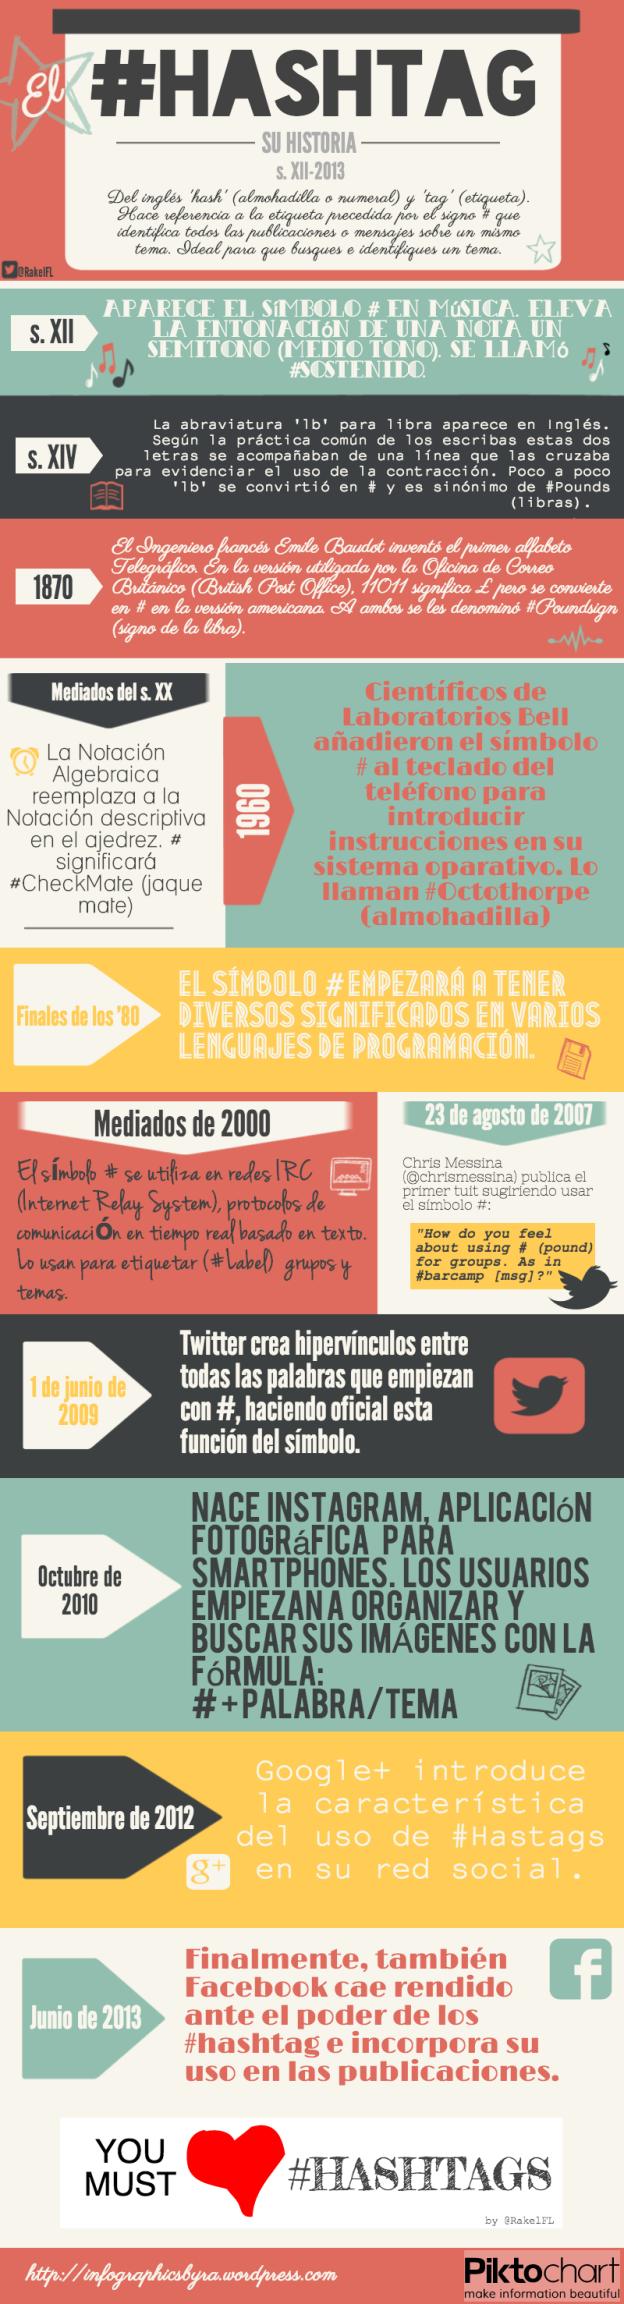 Infographics by Rakel Felipe